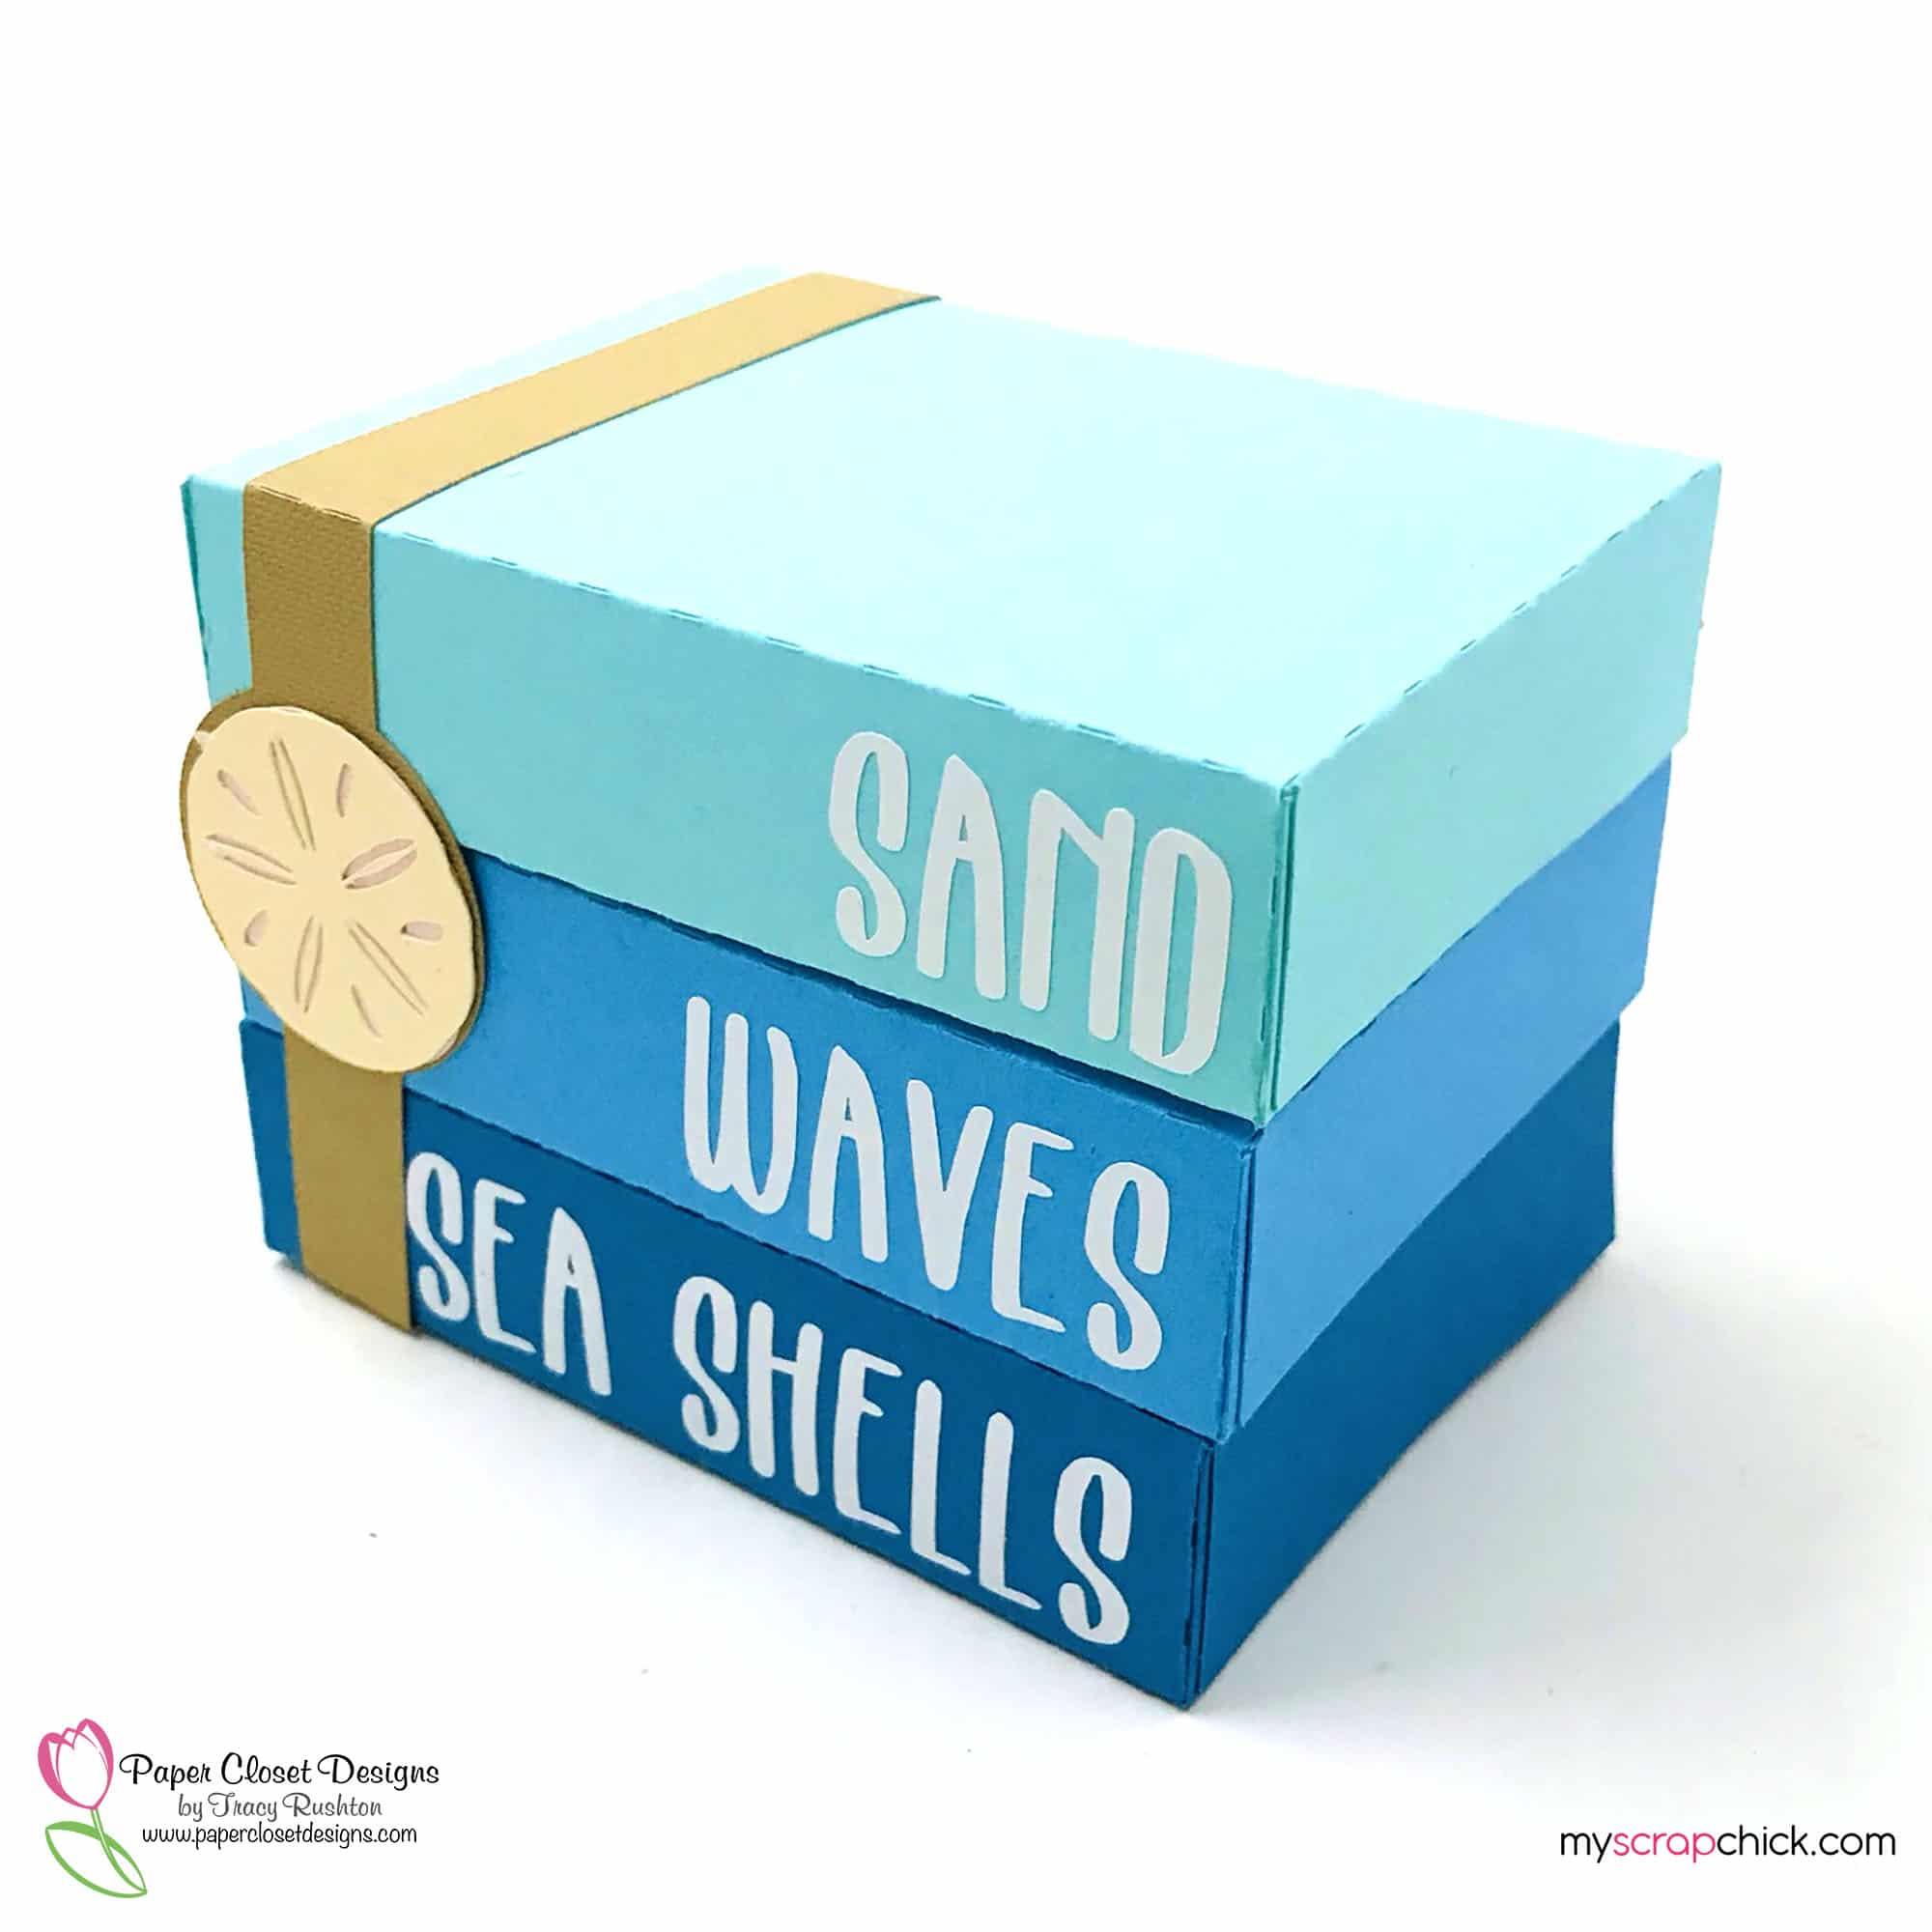 Sand Waves Sea Shells 2